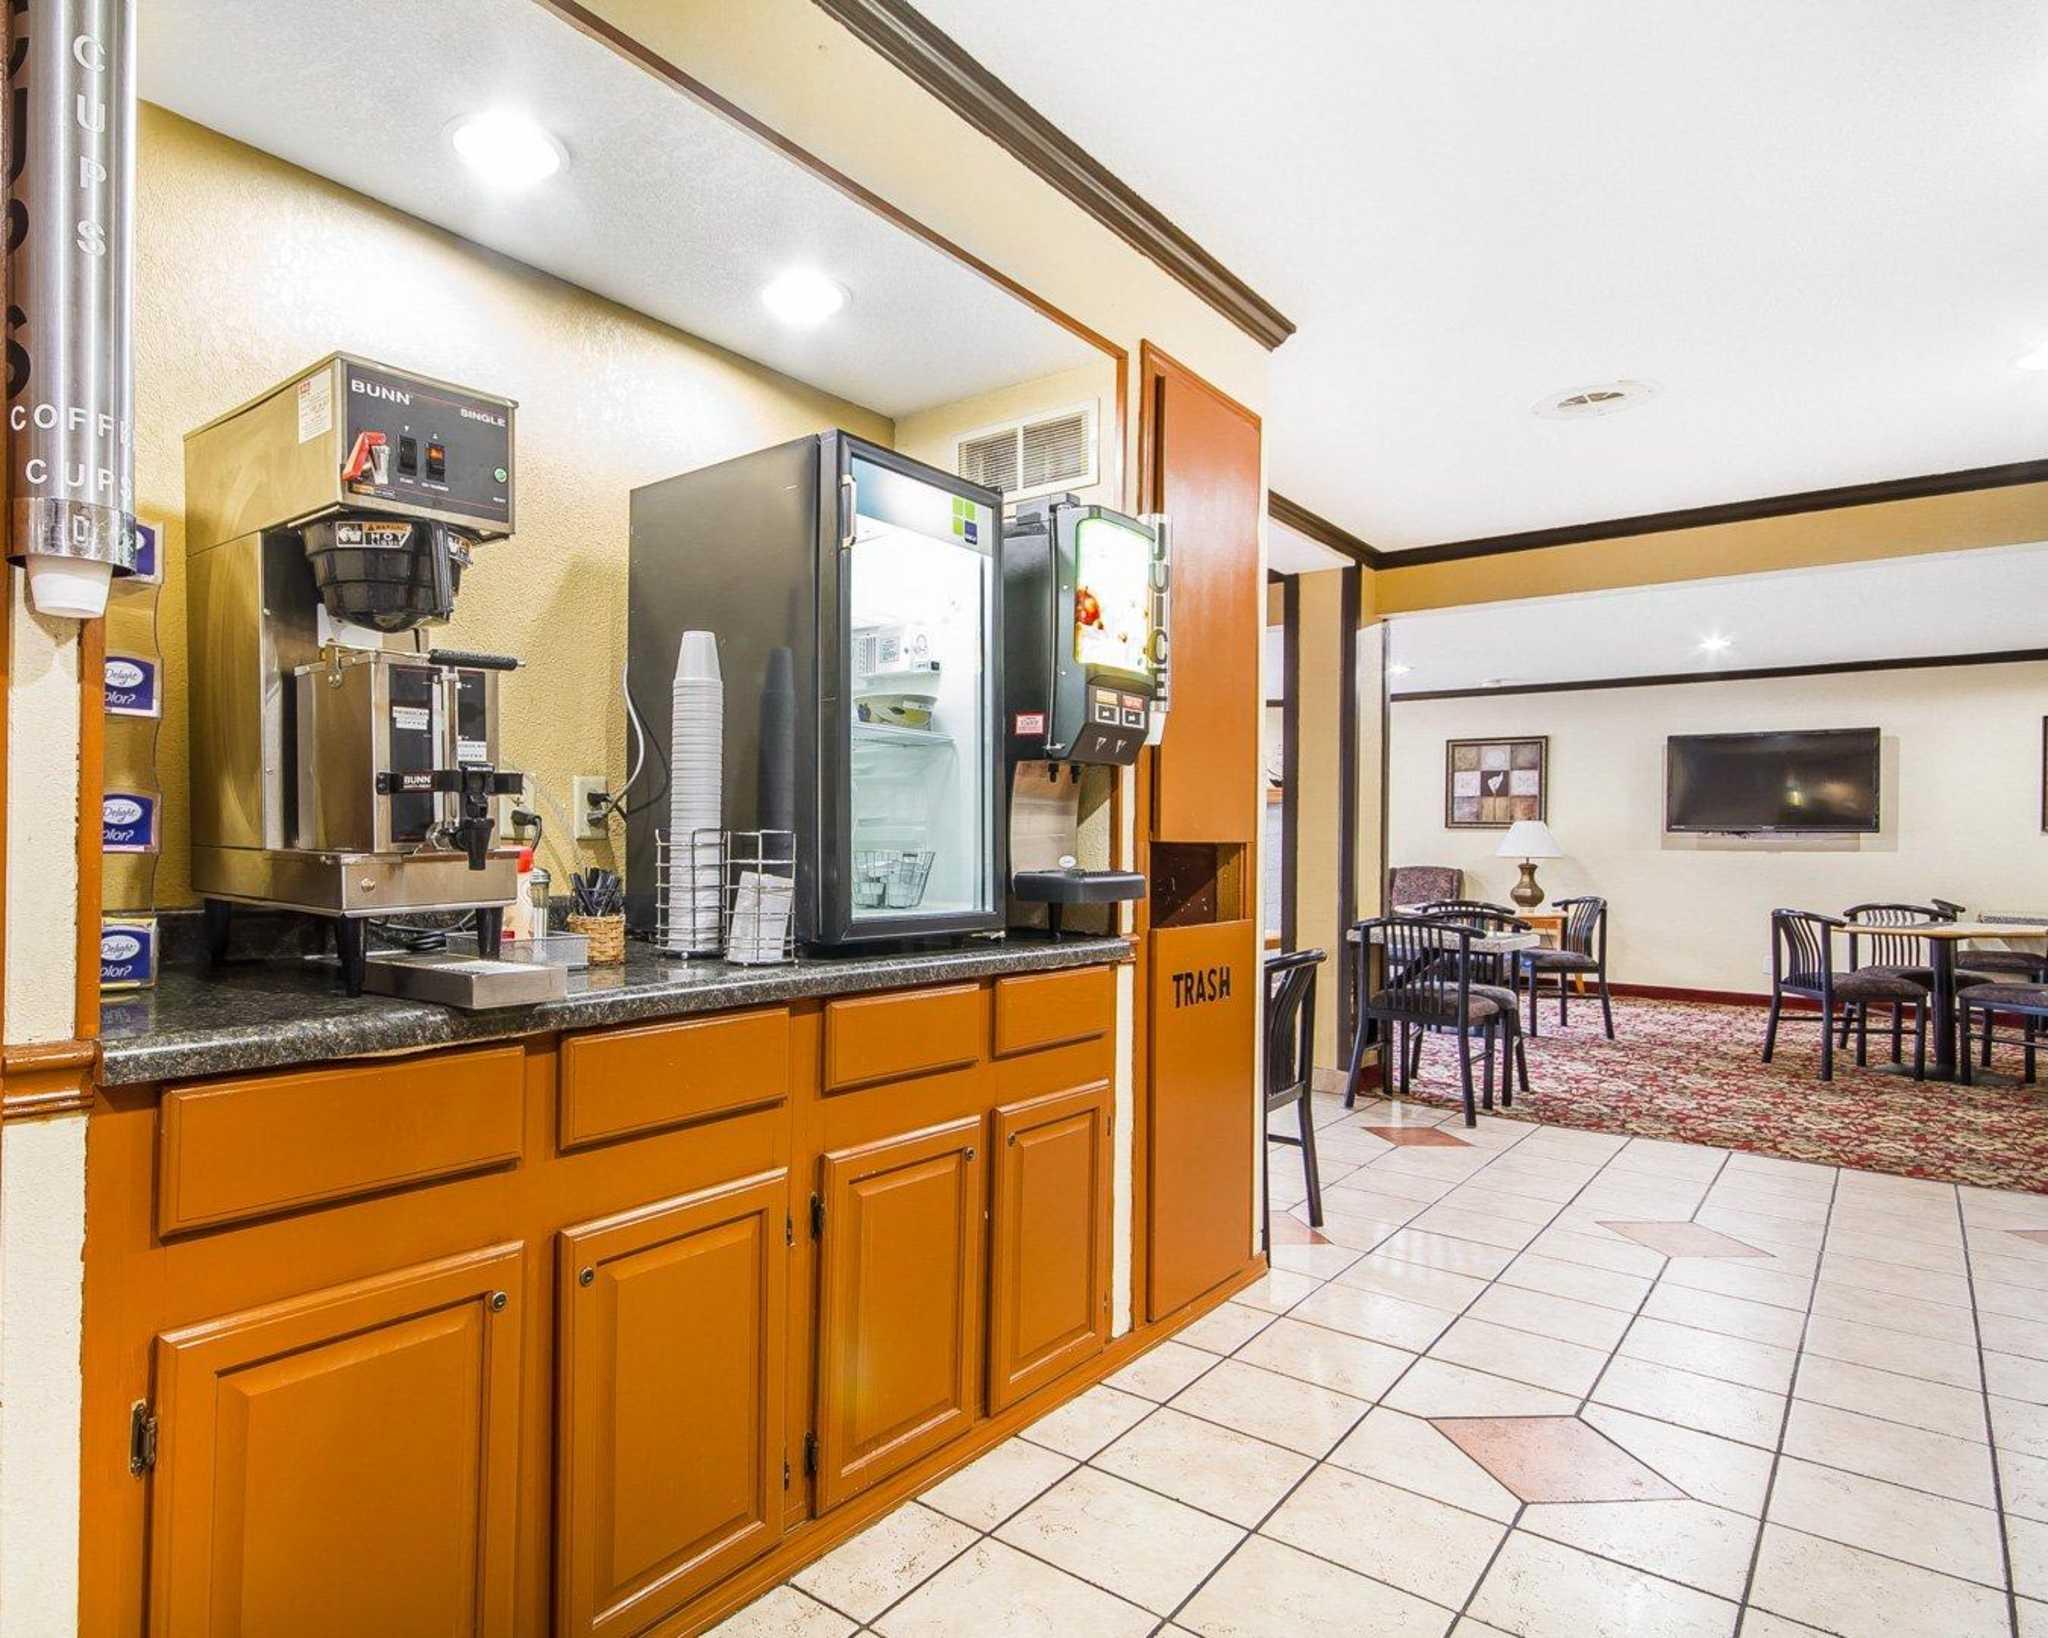 Rodeway Inn Motel, Madison Heights - tripadvisor.com